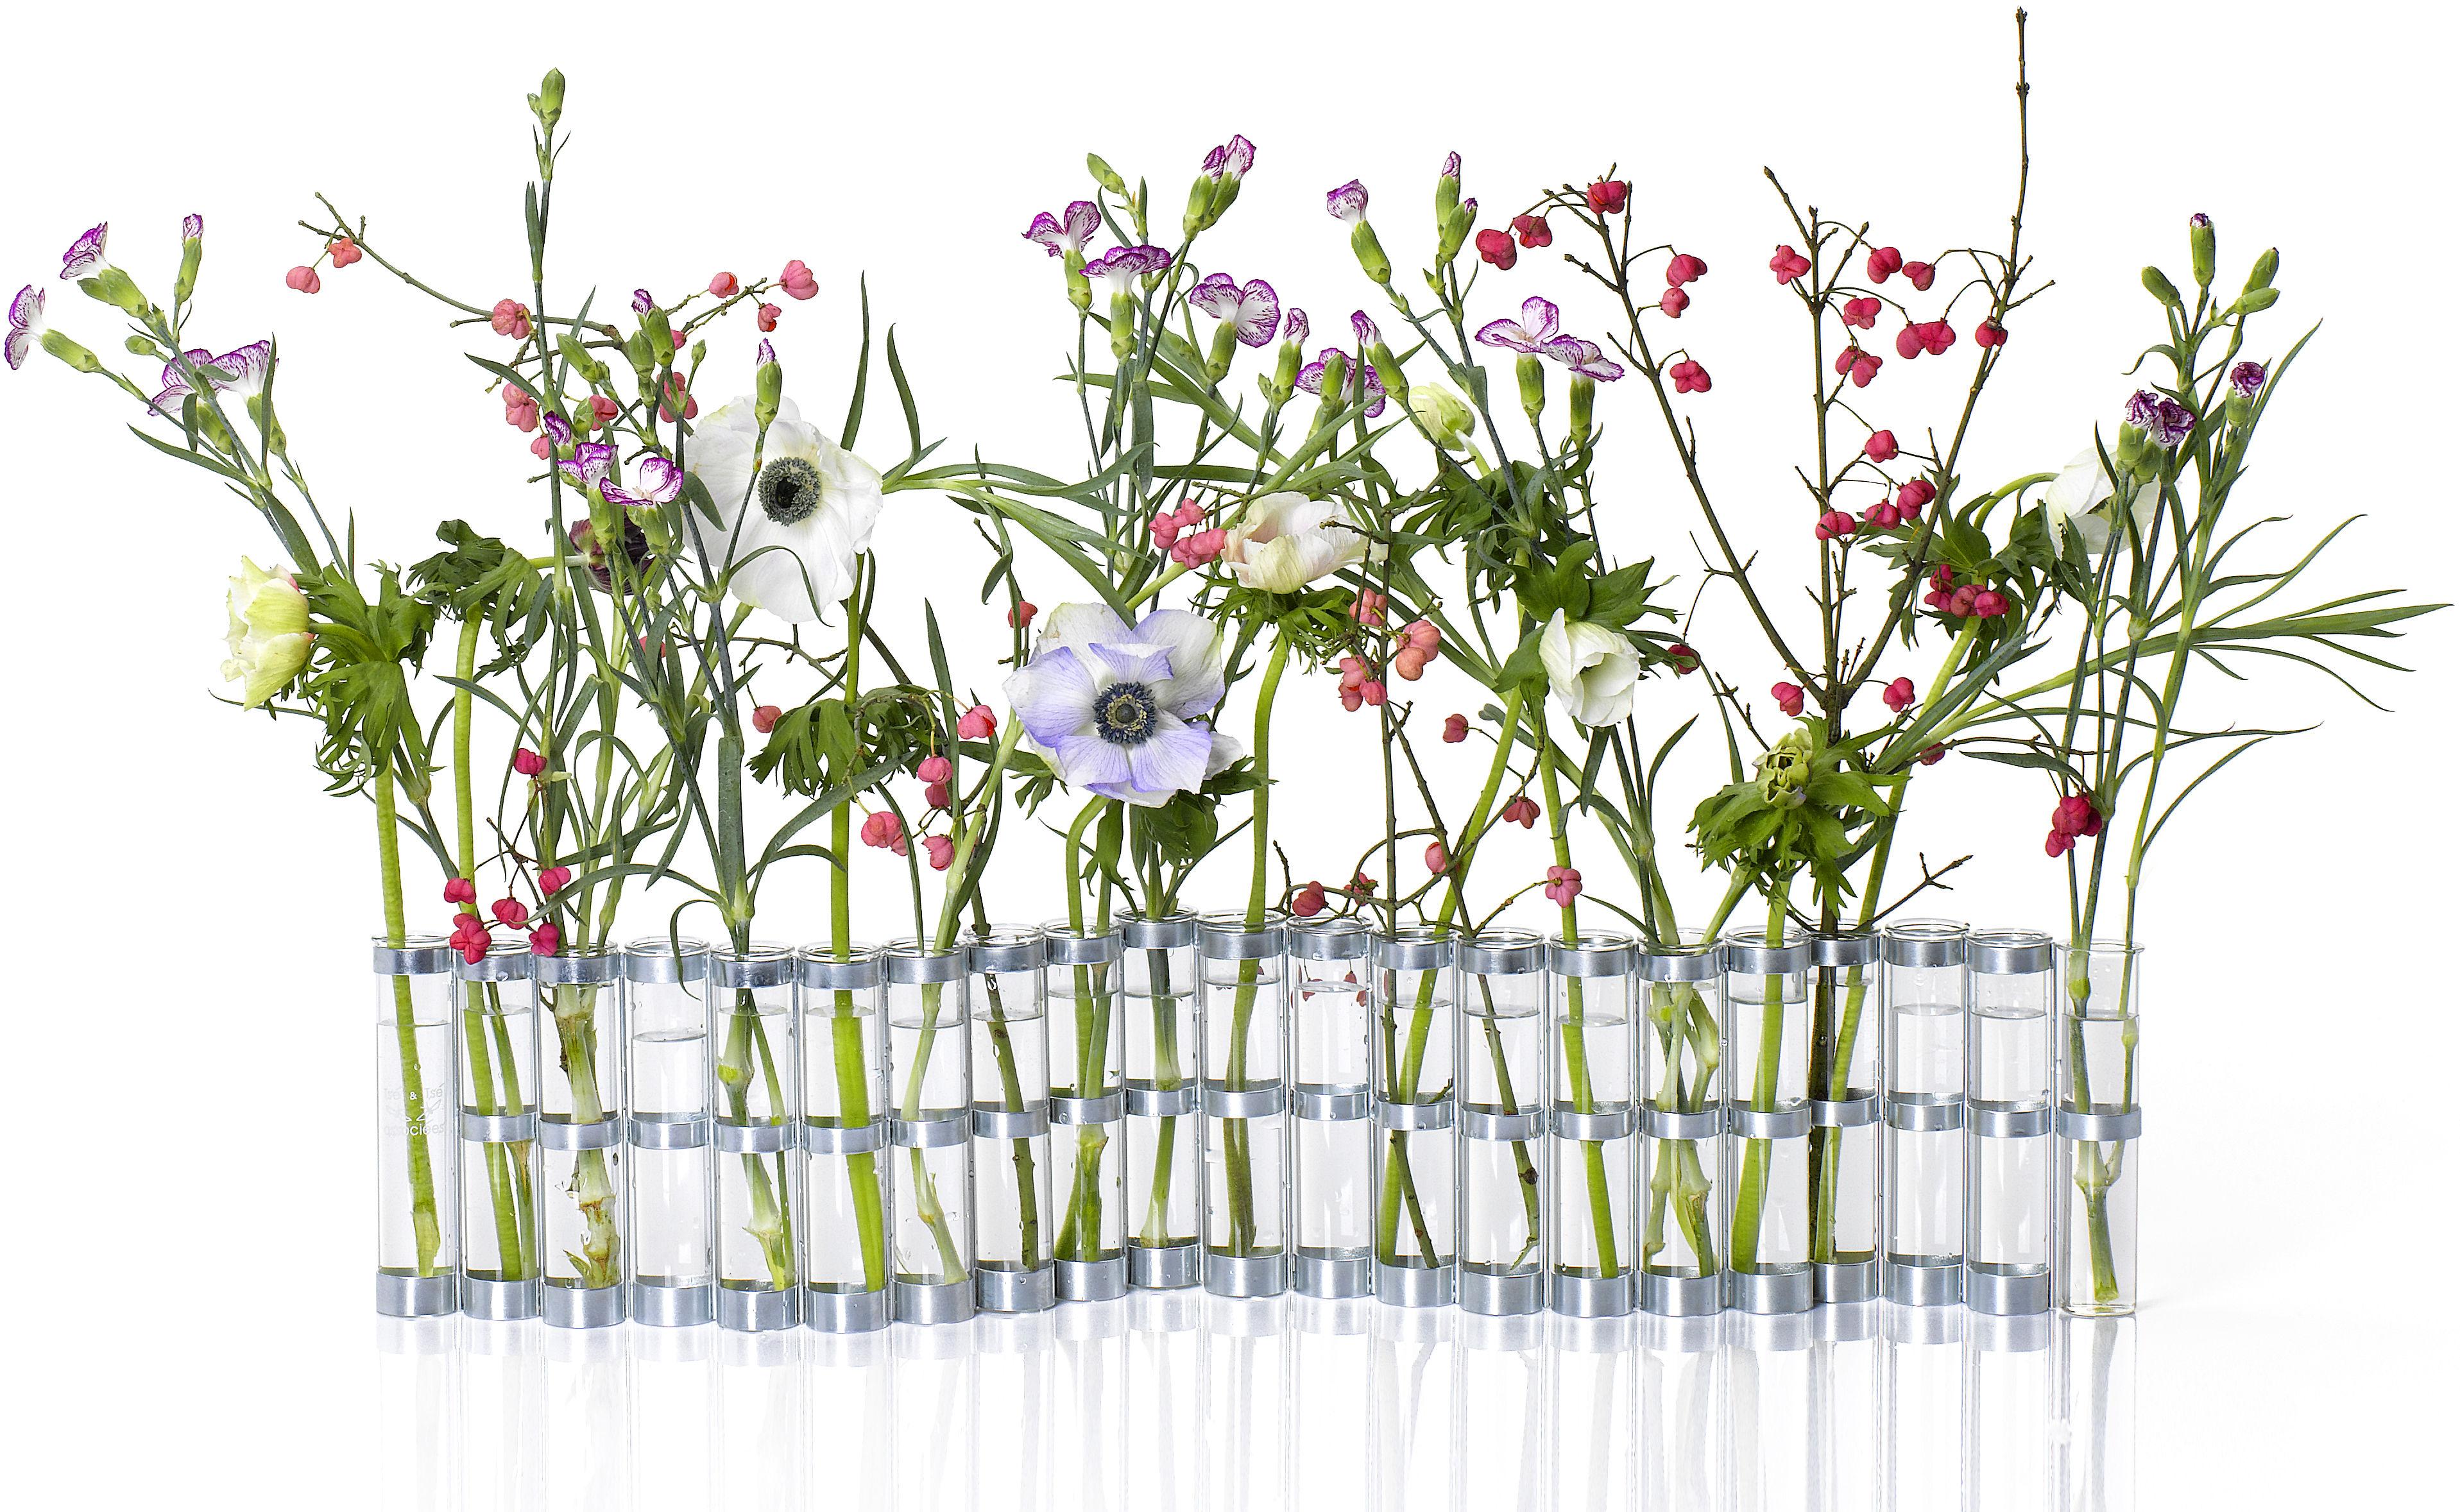 Déco - Vases - Vase d'avril Medium  / L 74 x H 15 cm - Tsé-Tsé - Medium - L 74 x H 15 cm - Acier zingué, Verre